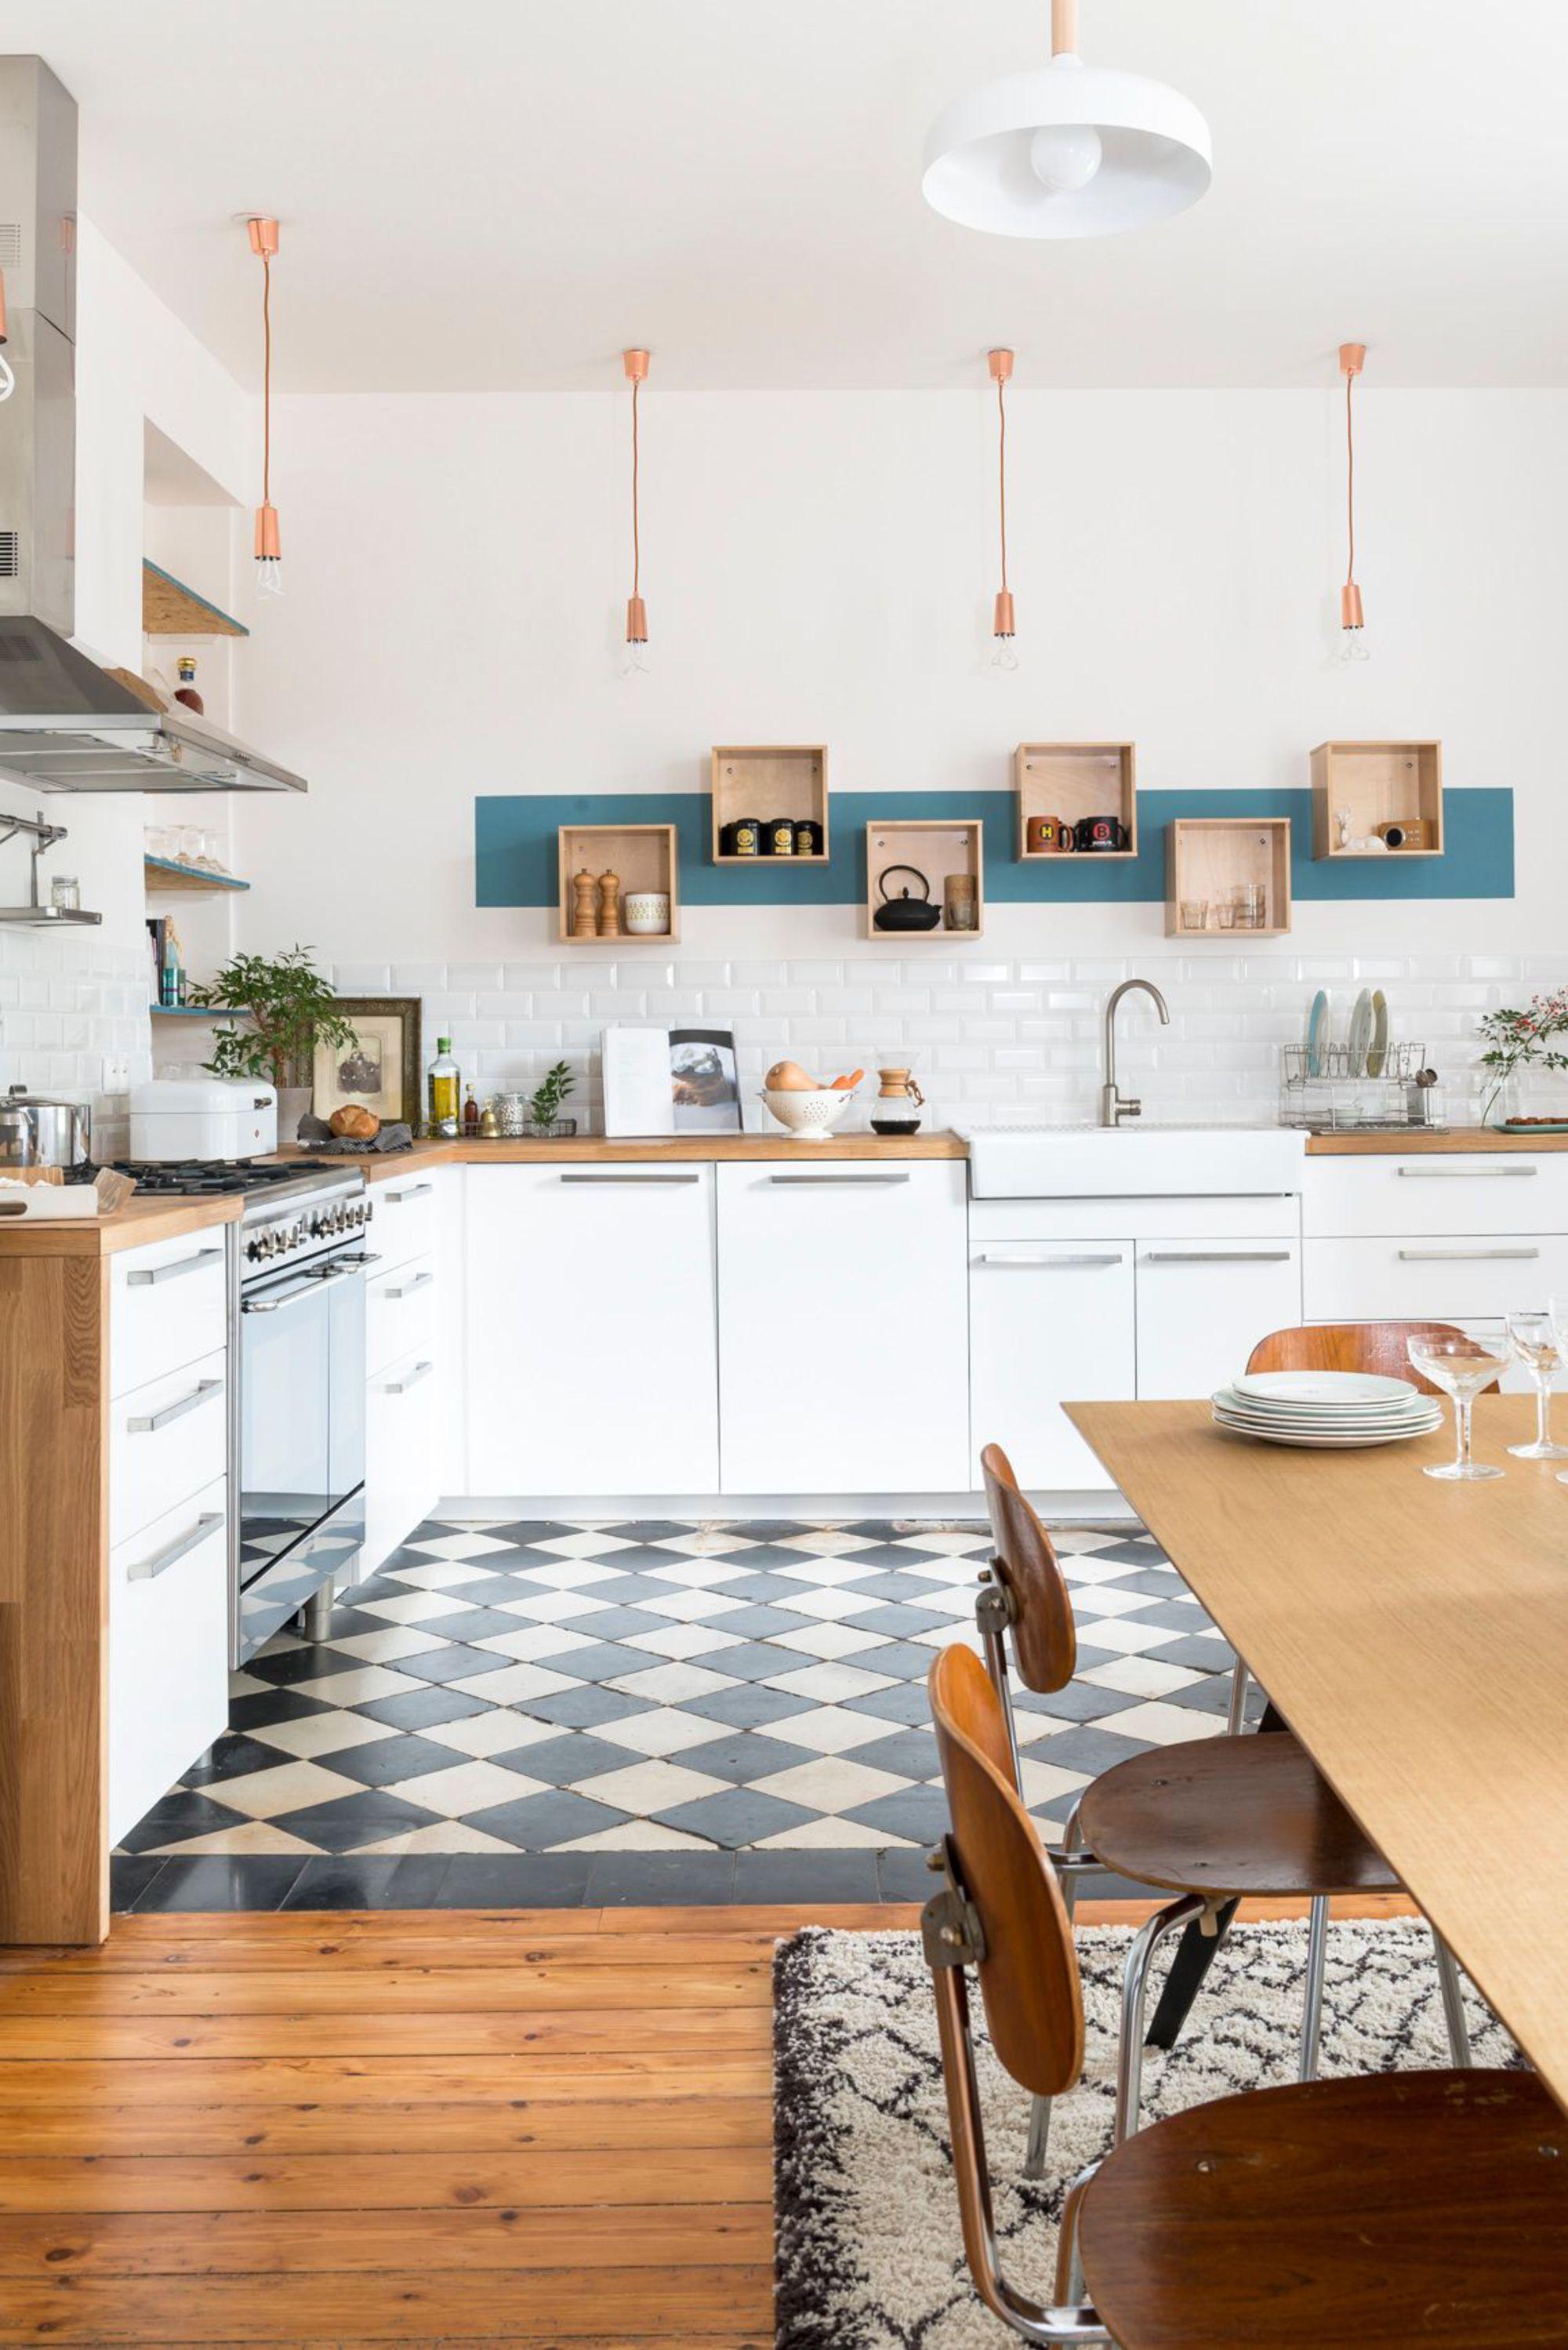 Carrelage Mural Cuisine Ikea cuisine carreaux ciment : 12 photos de cuisines tendance